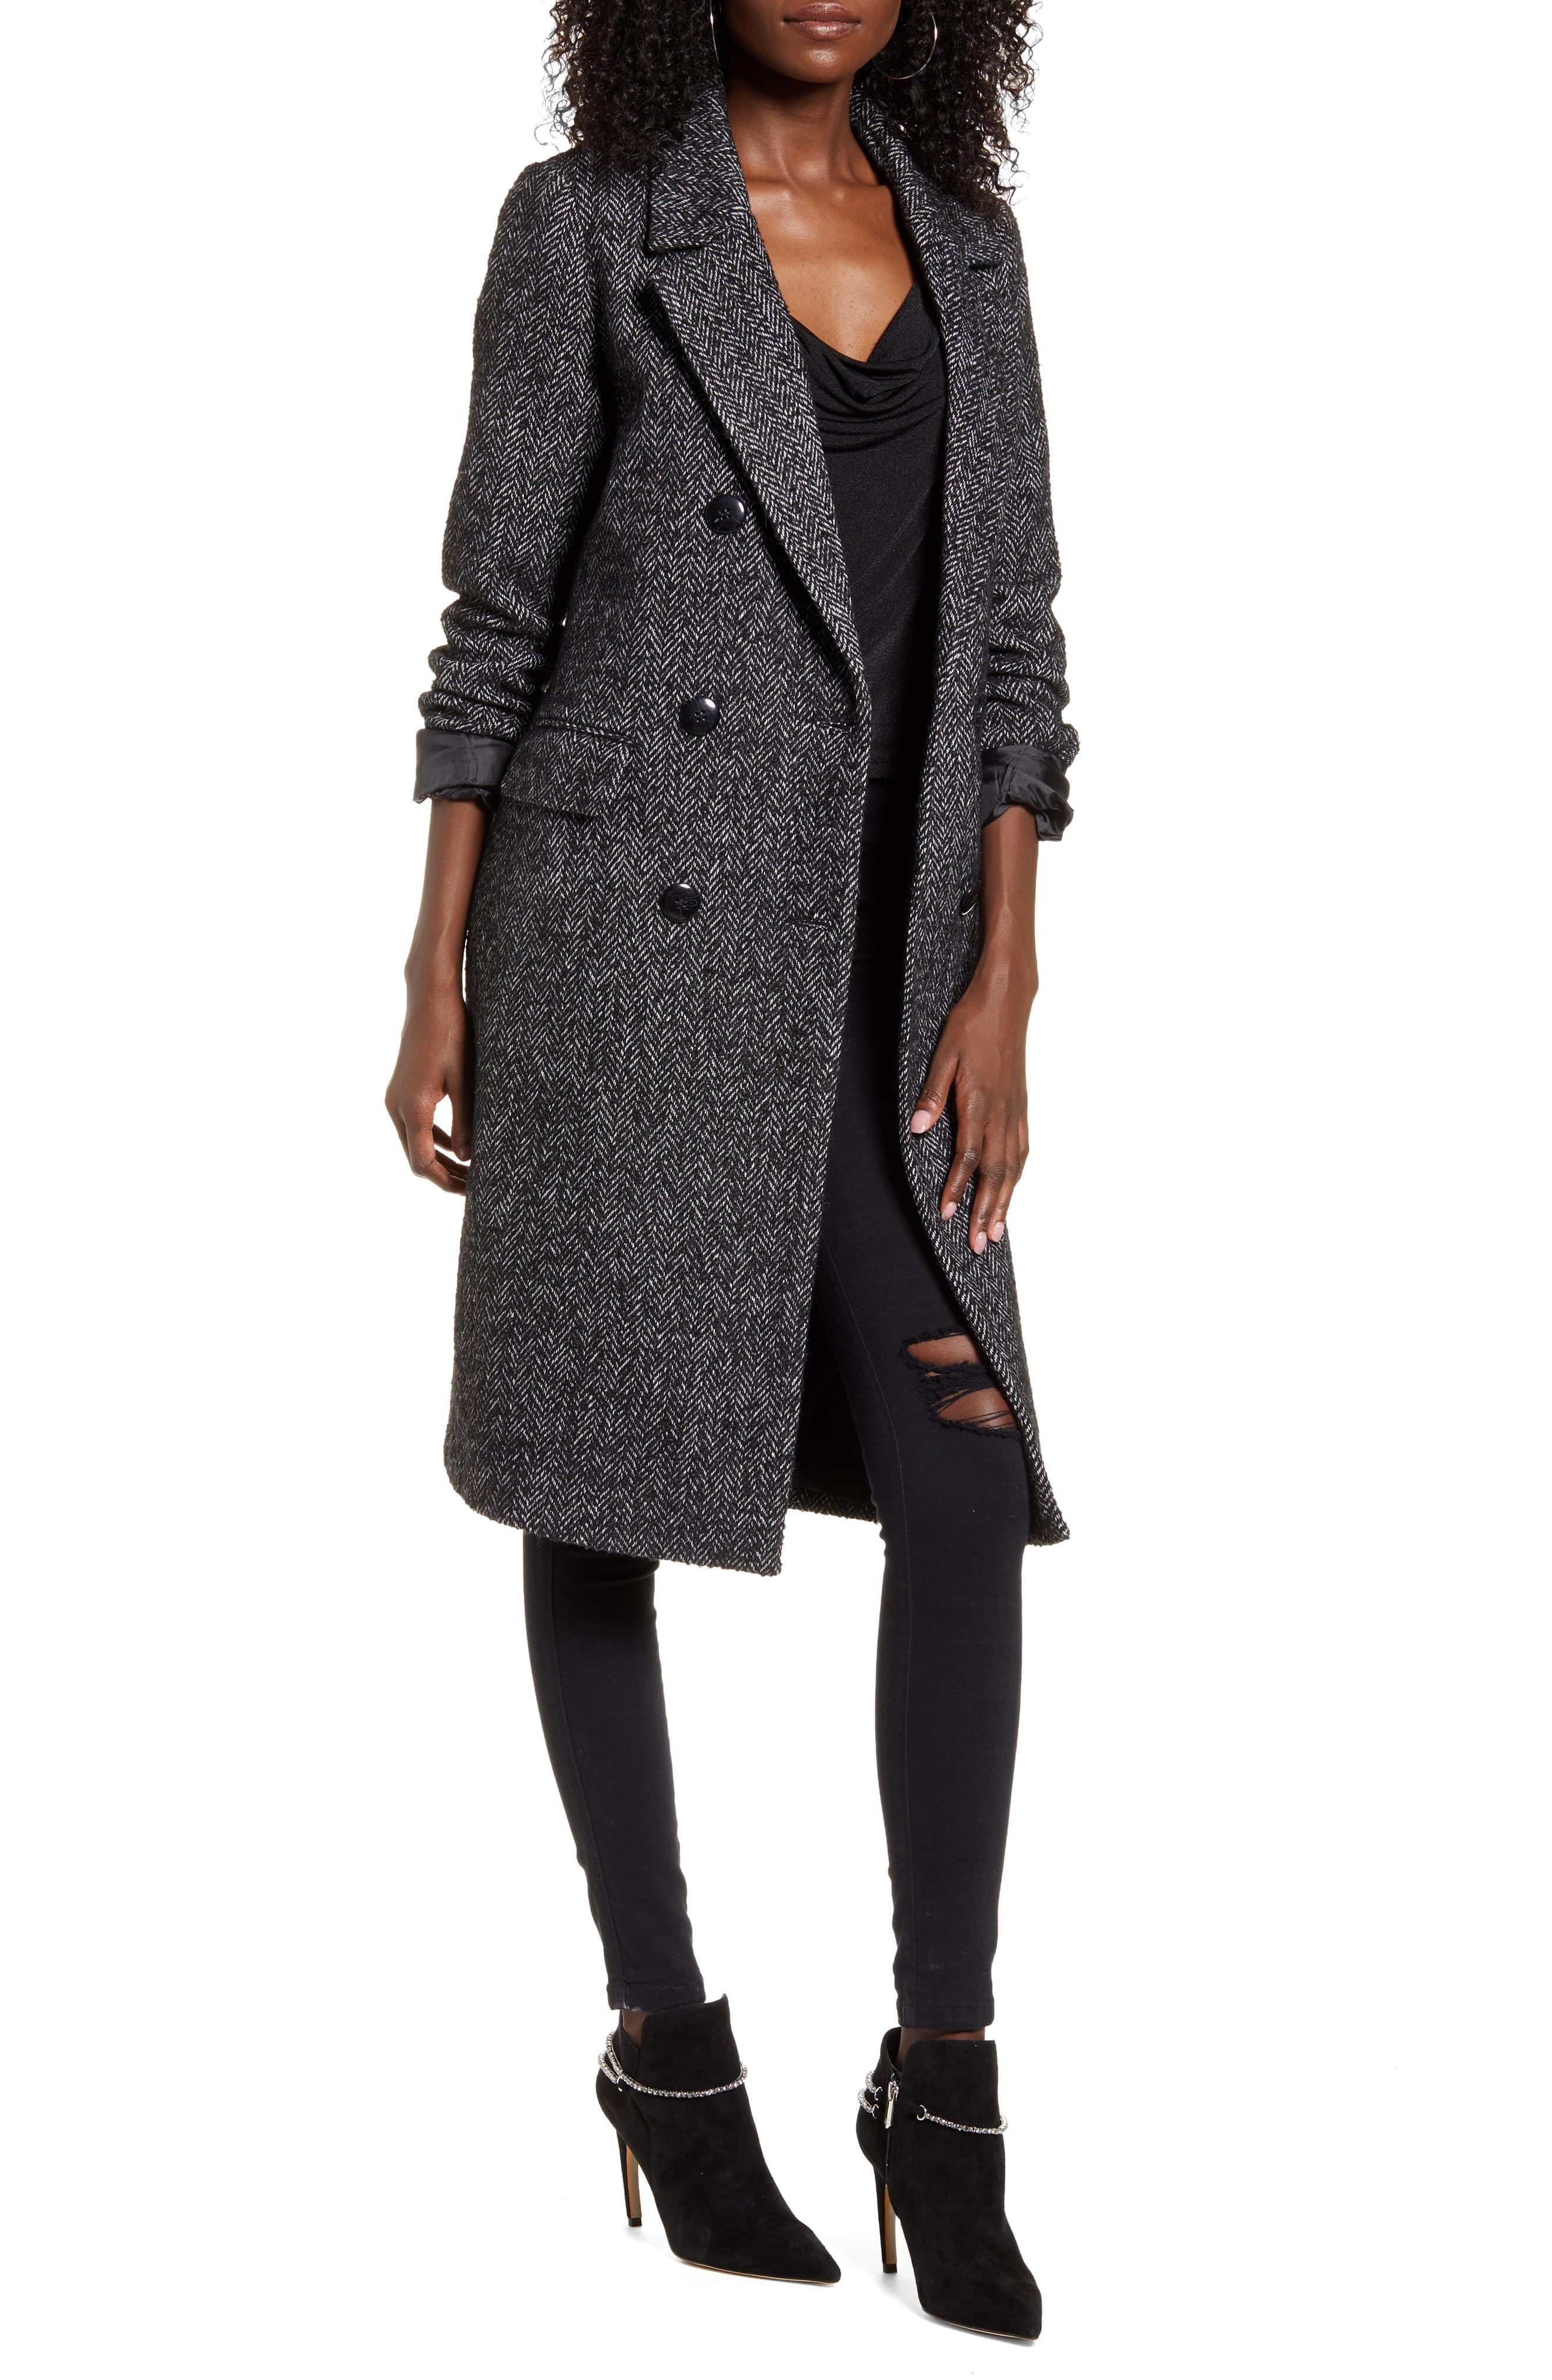 VERO MODA Highland Herringbone Coat available at